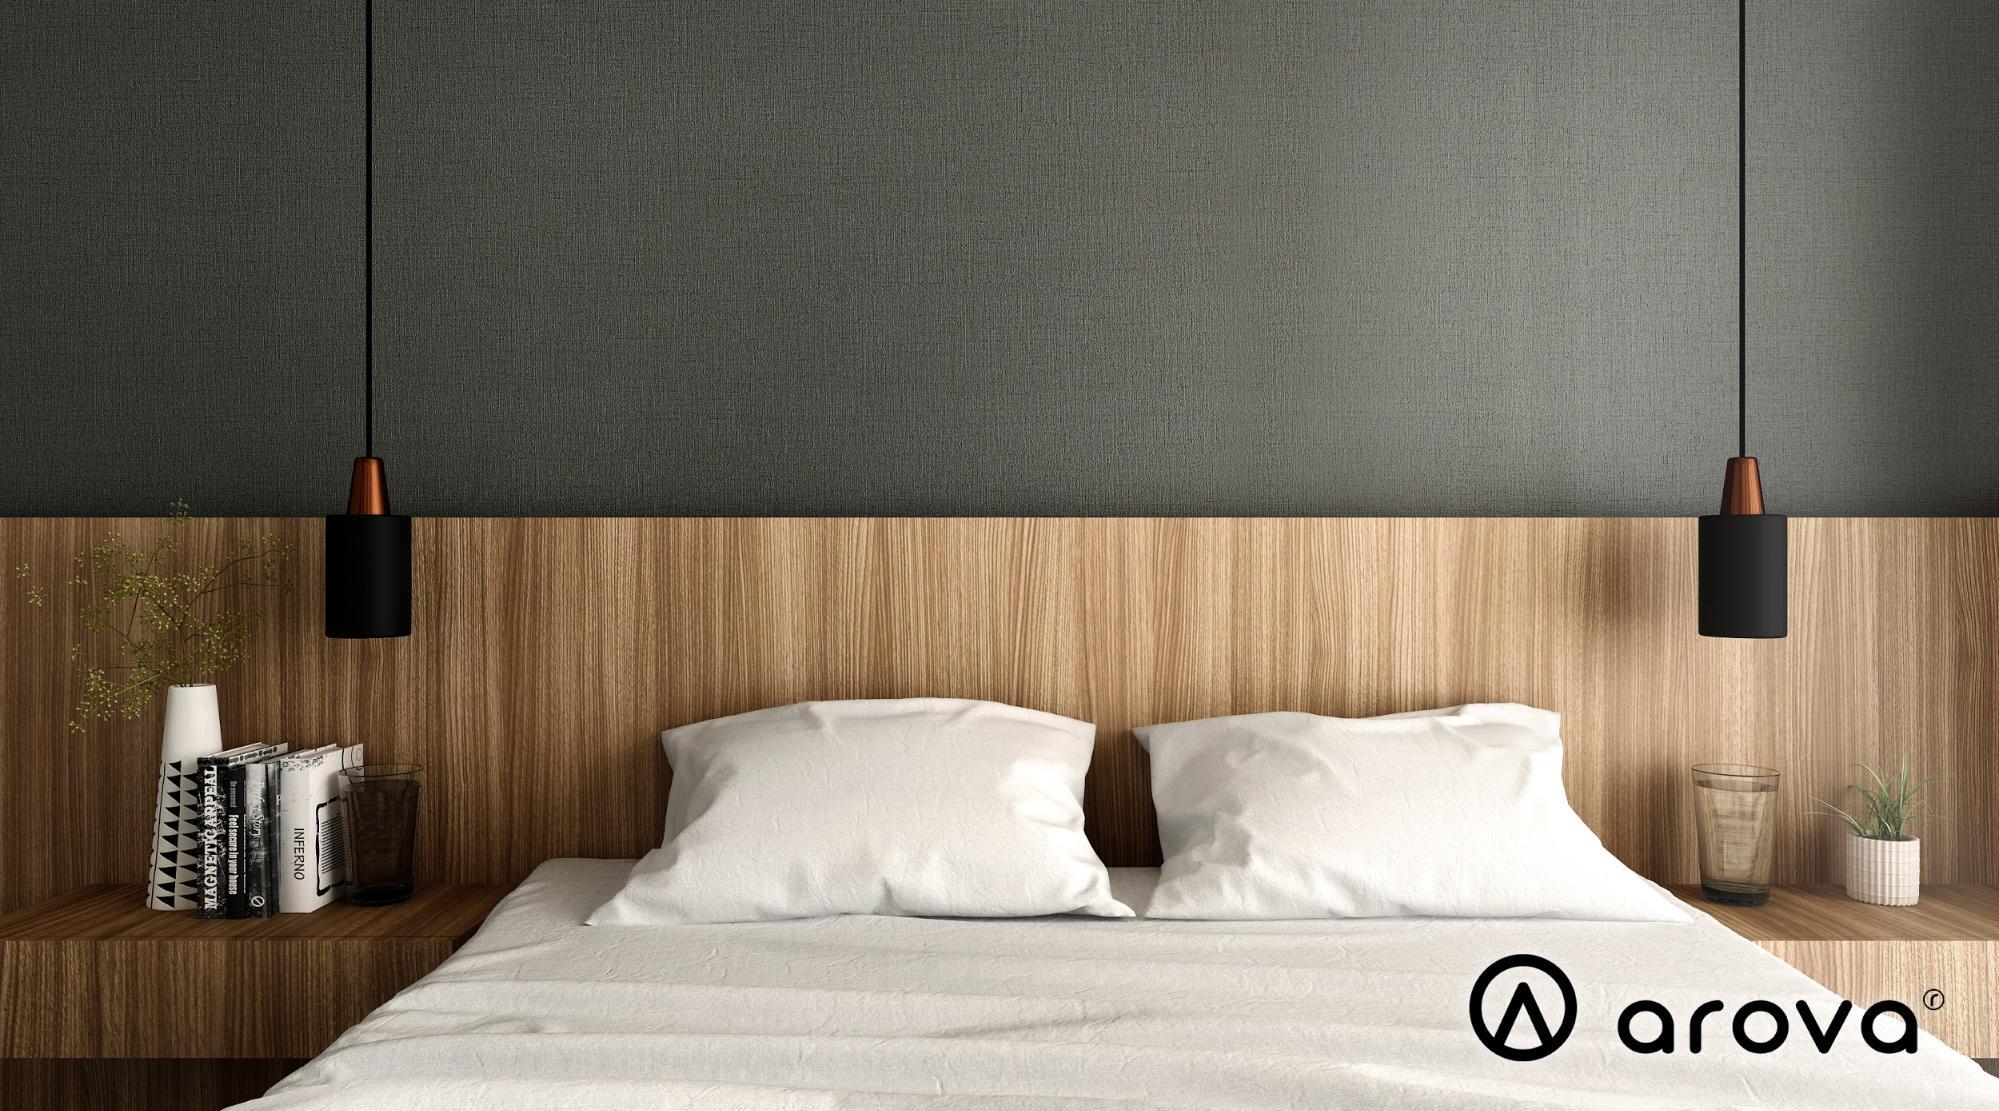 Textured laminates on bedframe